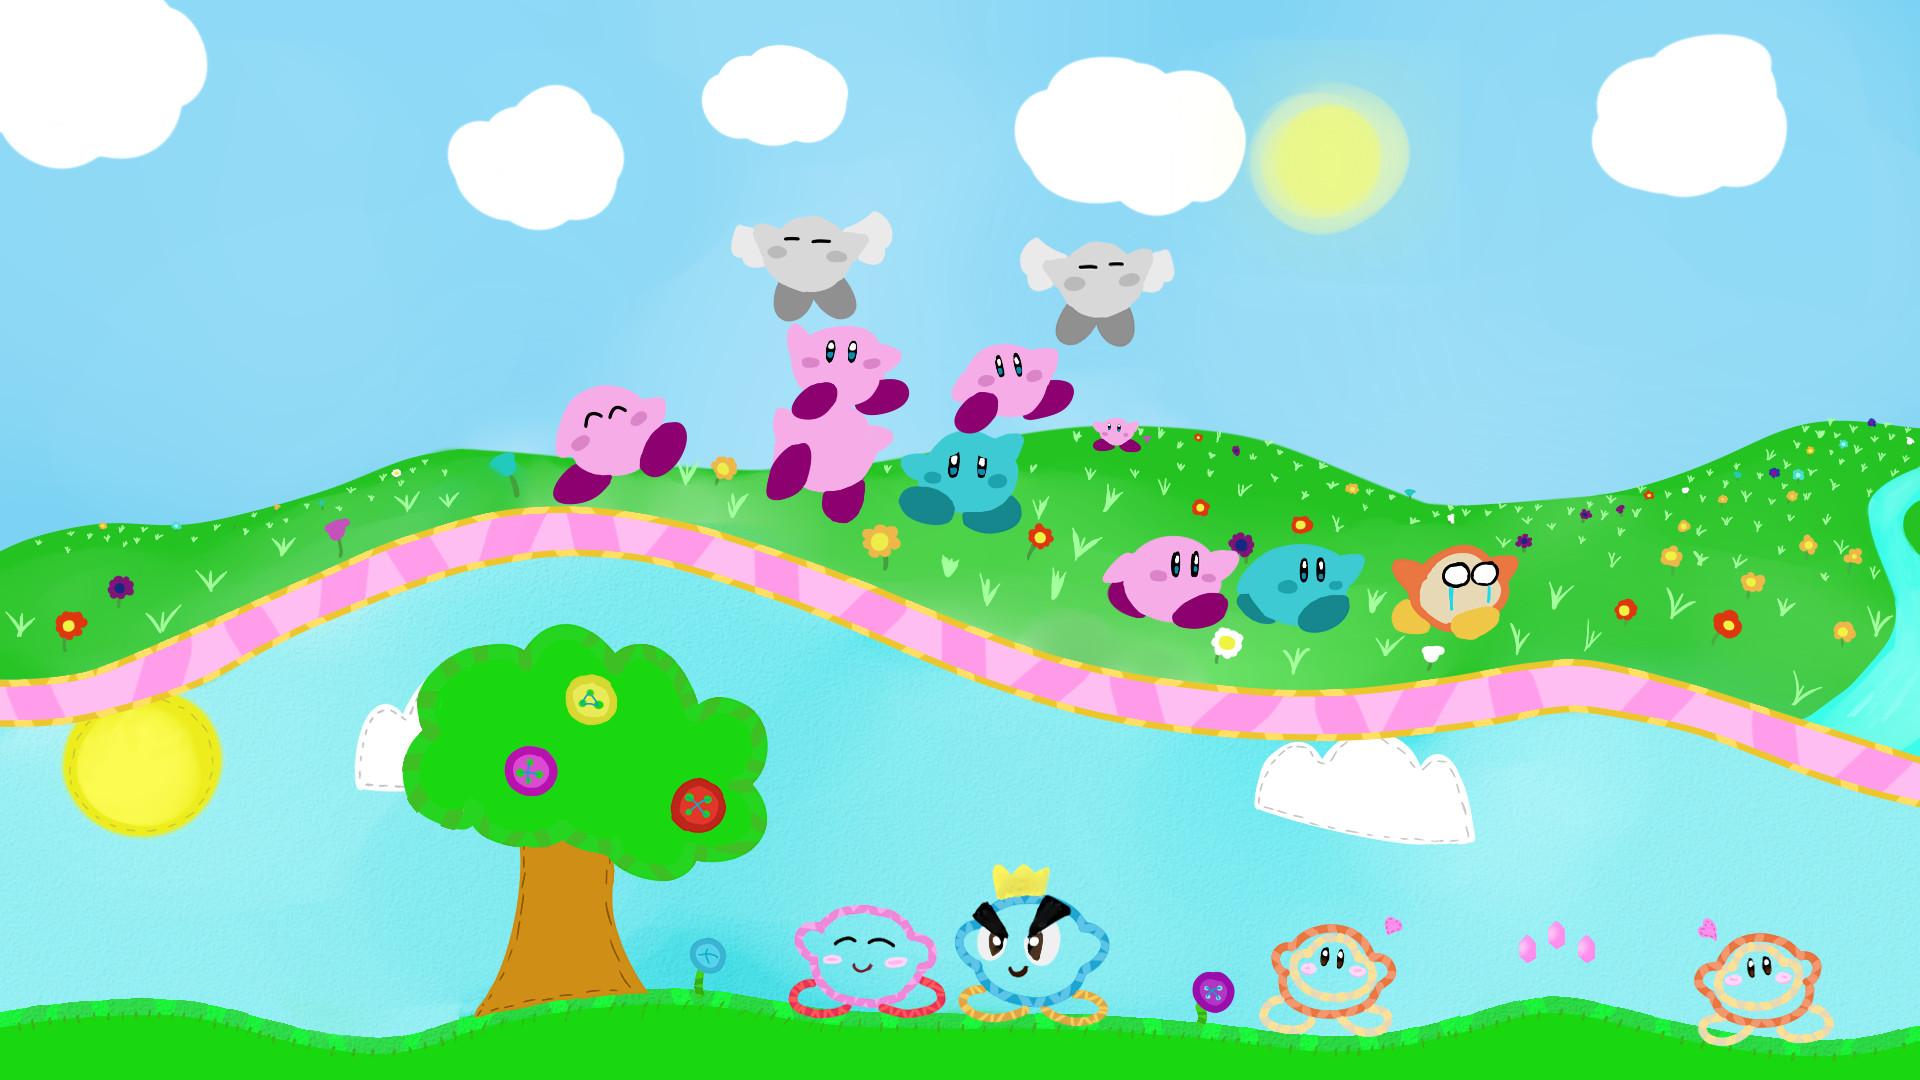 … NintendoJoshUp Kirby Wallpaper (1920×1080) by NintendoJoshUp